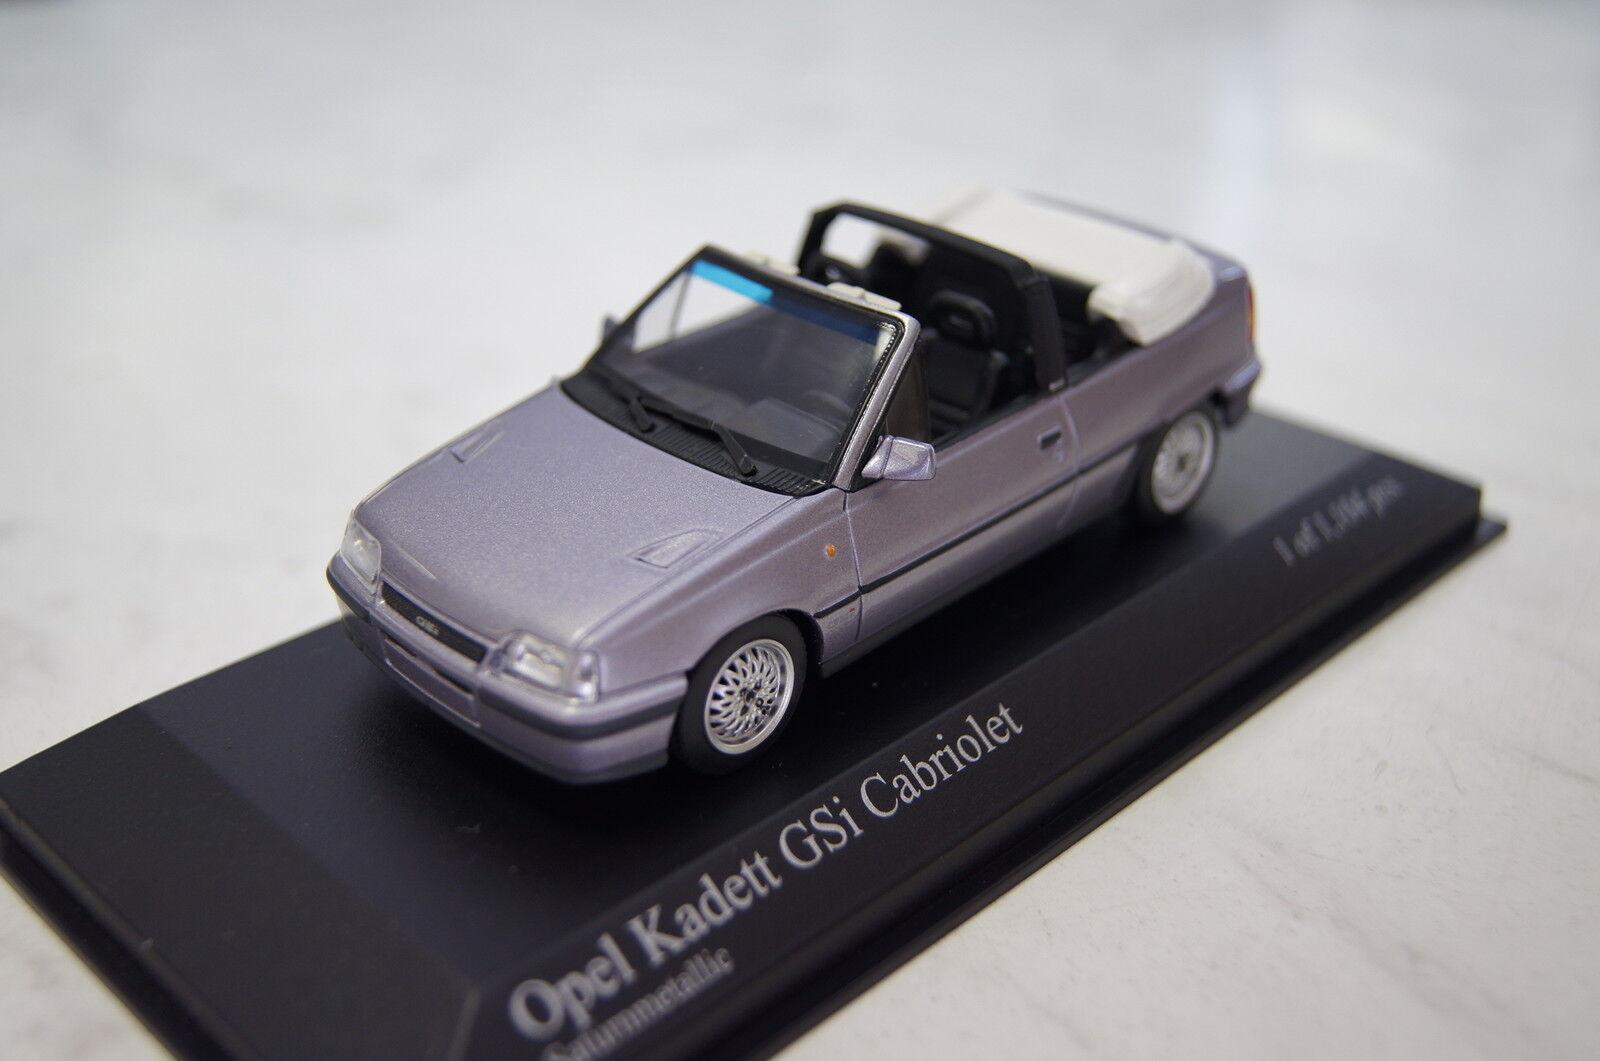 Opel Kadett Kadett Kadett E GSI Cabrio purple 1989 1 43  Minichamps neu & OVP d40182